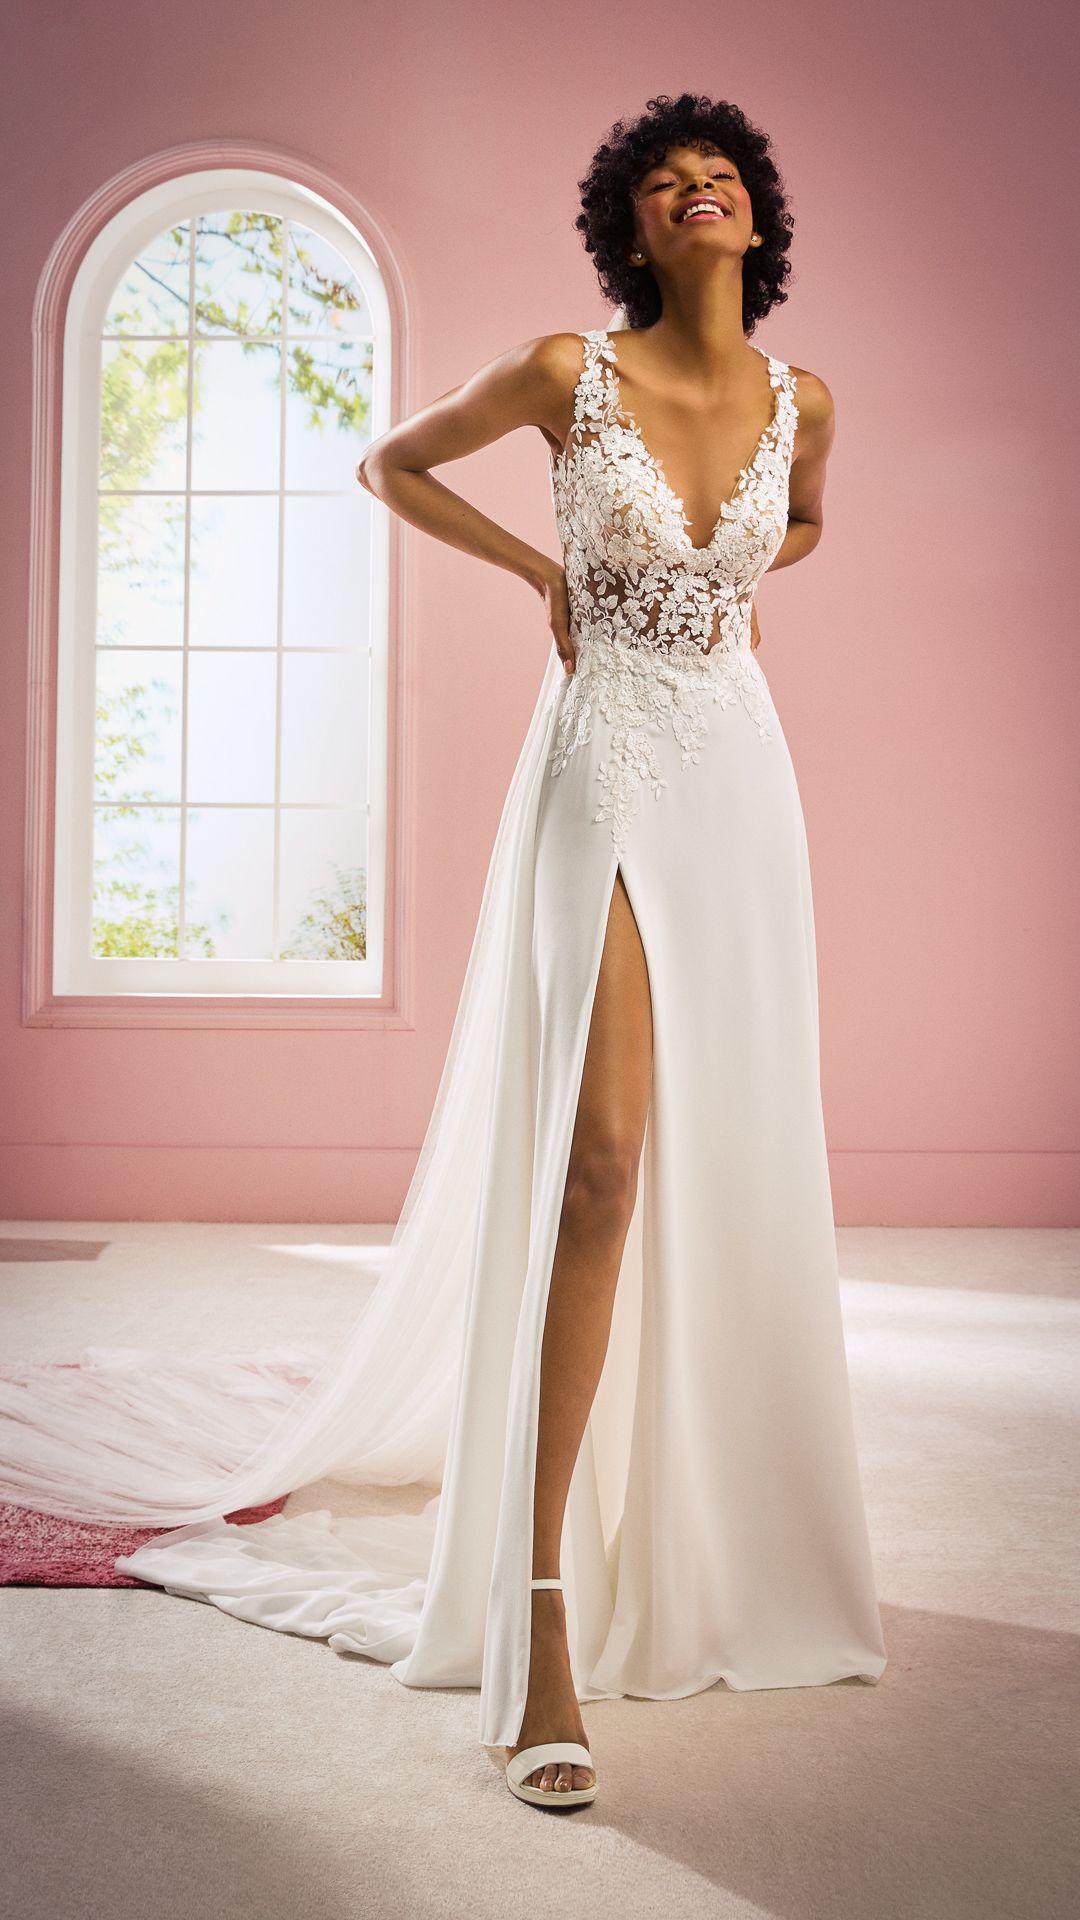 Hochzeitskleider 16 White One Kollektion Modell: AMA-B